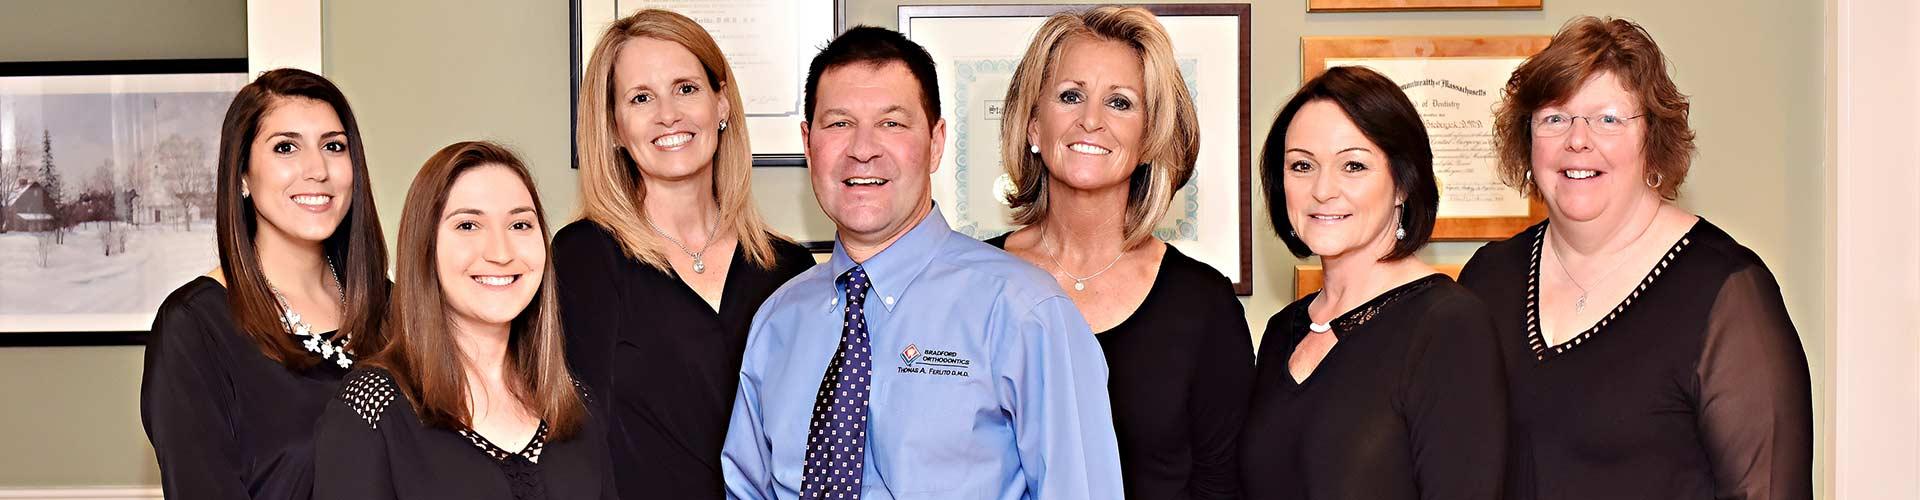 Staff Photo at Bradford Orthodontics in Bradford MA